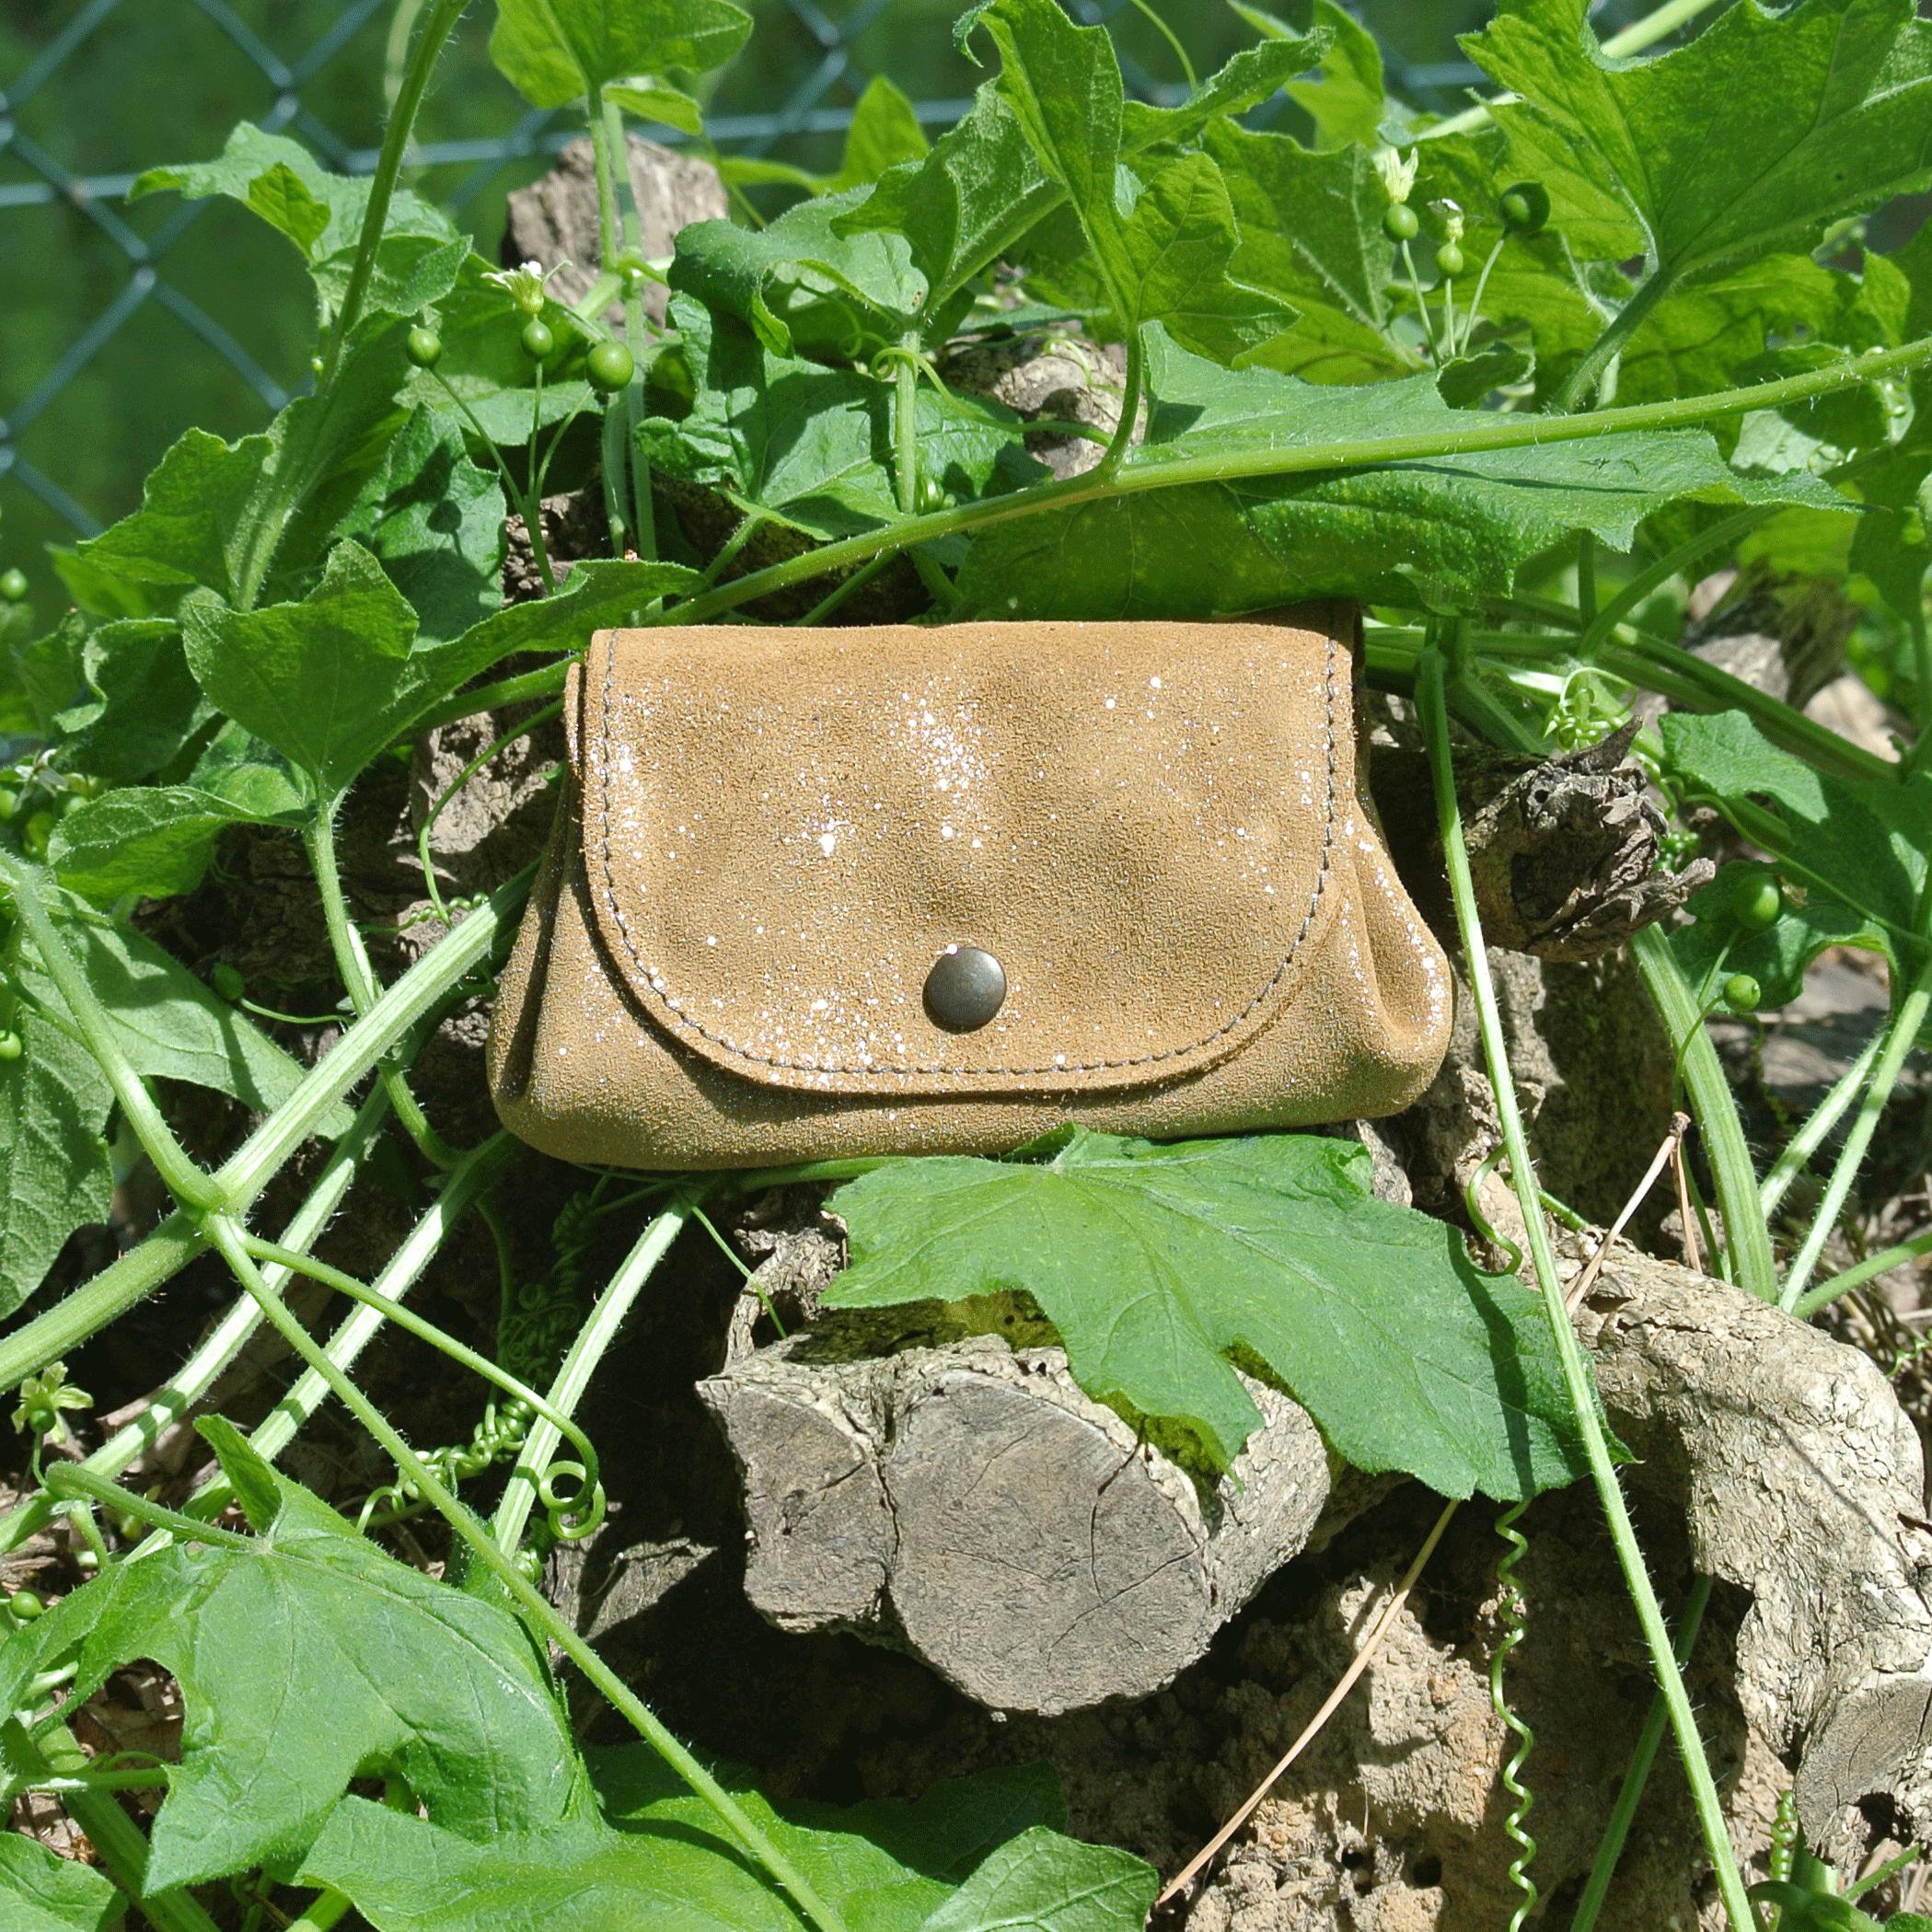 cuirs-fantaisies-la-cartabliere-fabrique-en-france-porte-monnaie-accordeon-en-cuir-paillete-rhizome